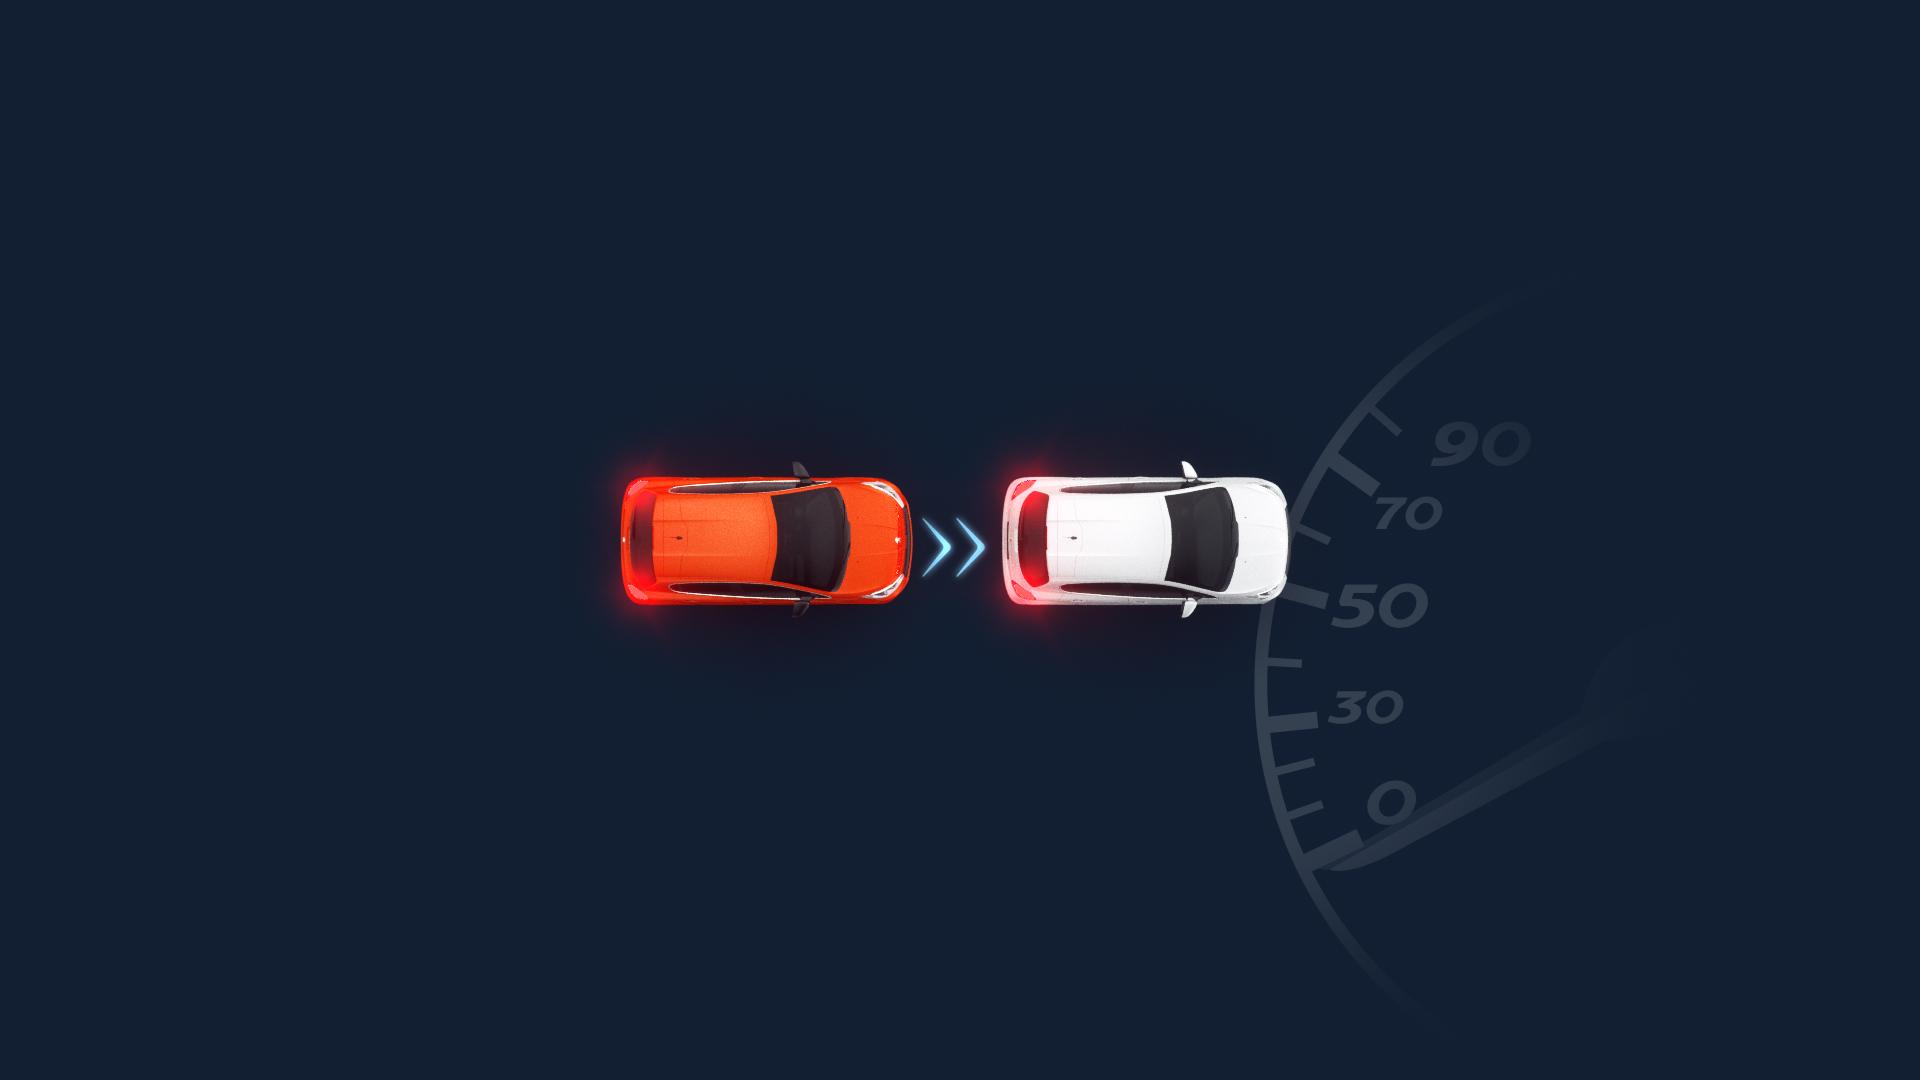 3D Motion Design animation of a car parking